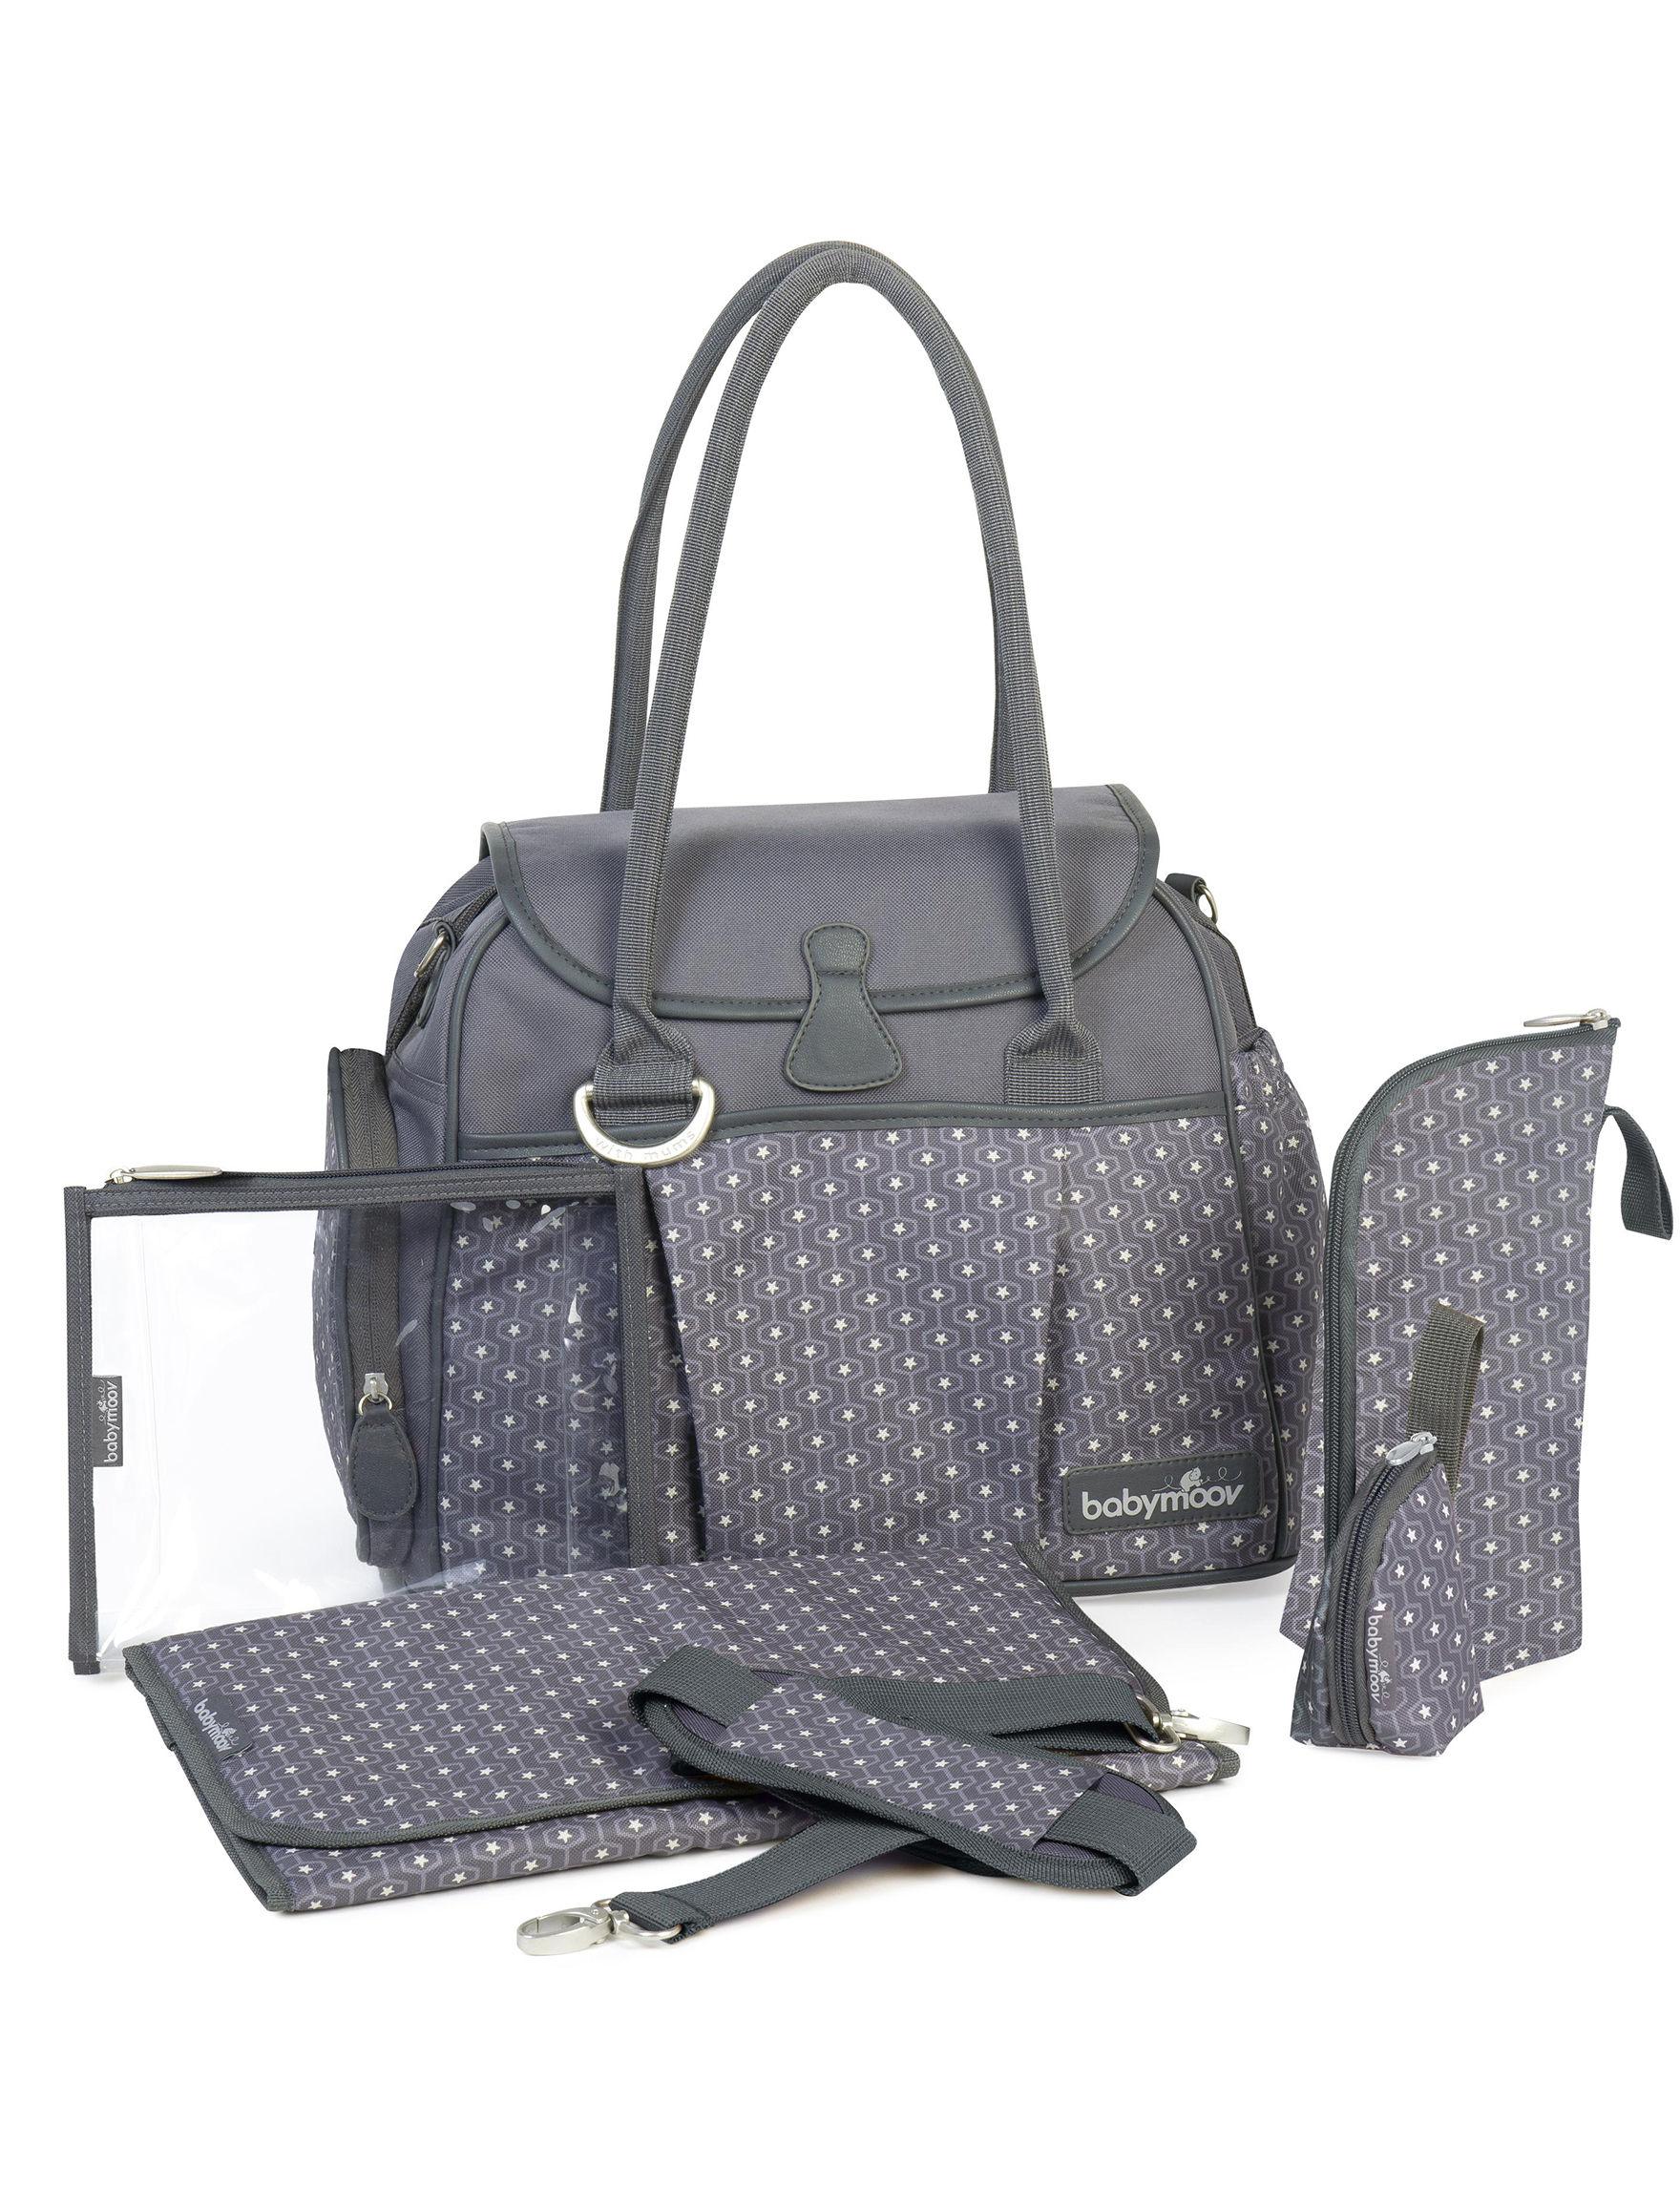 Babymoov Grey Diaper Bags